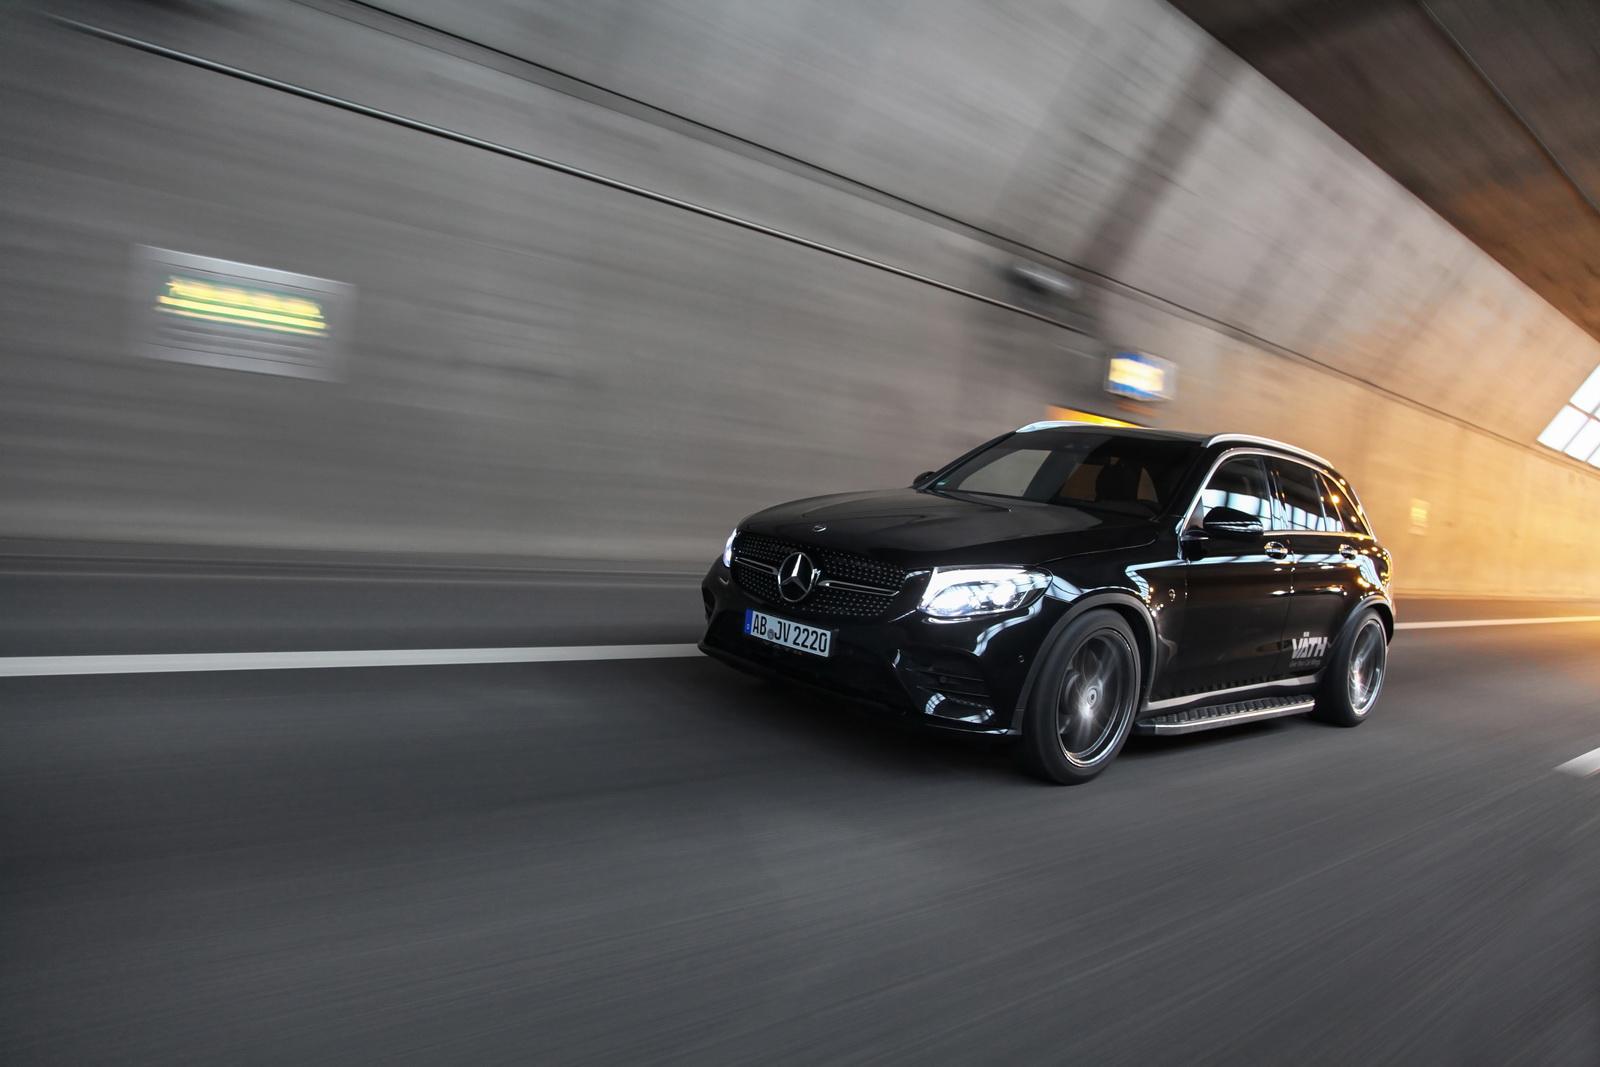 Mercedes_GLC220d_by_Vath_13